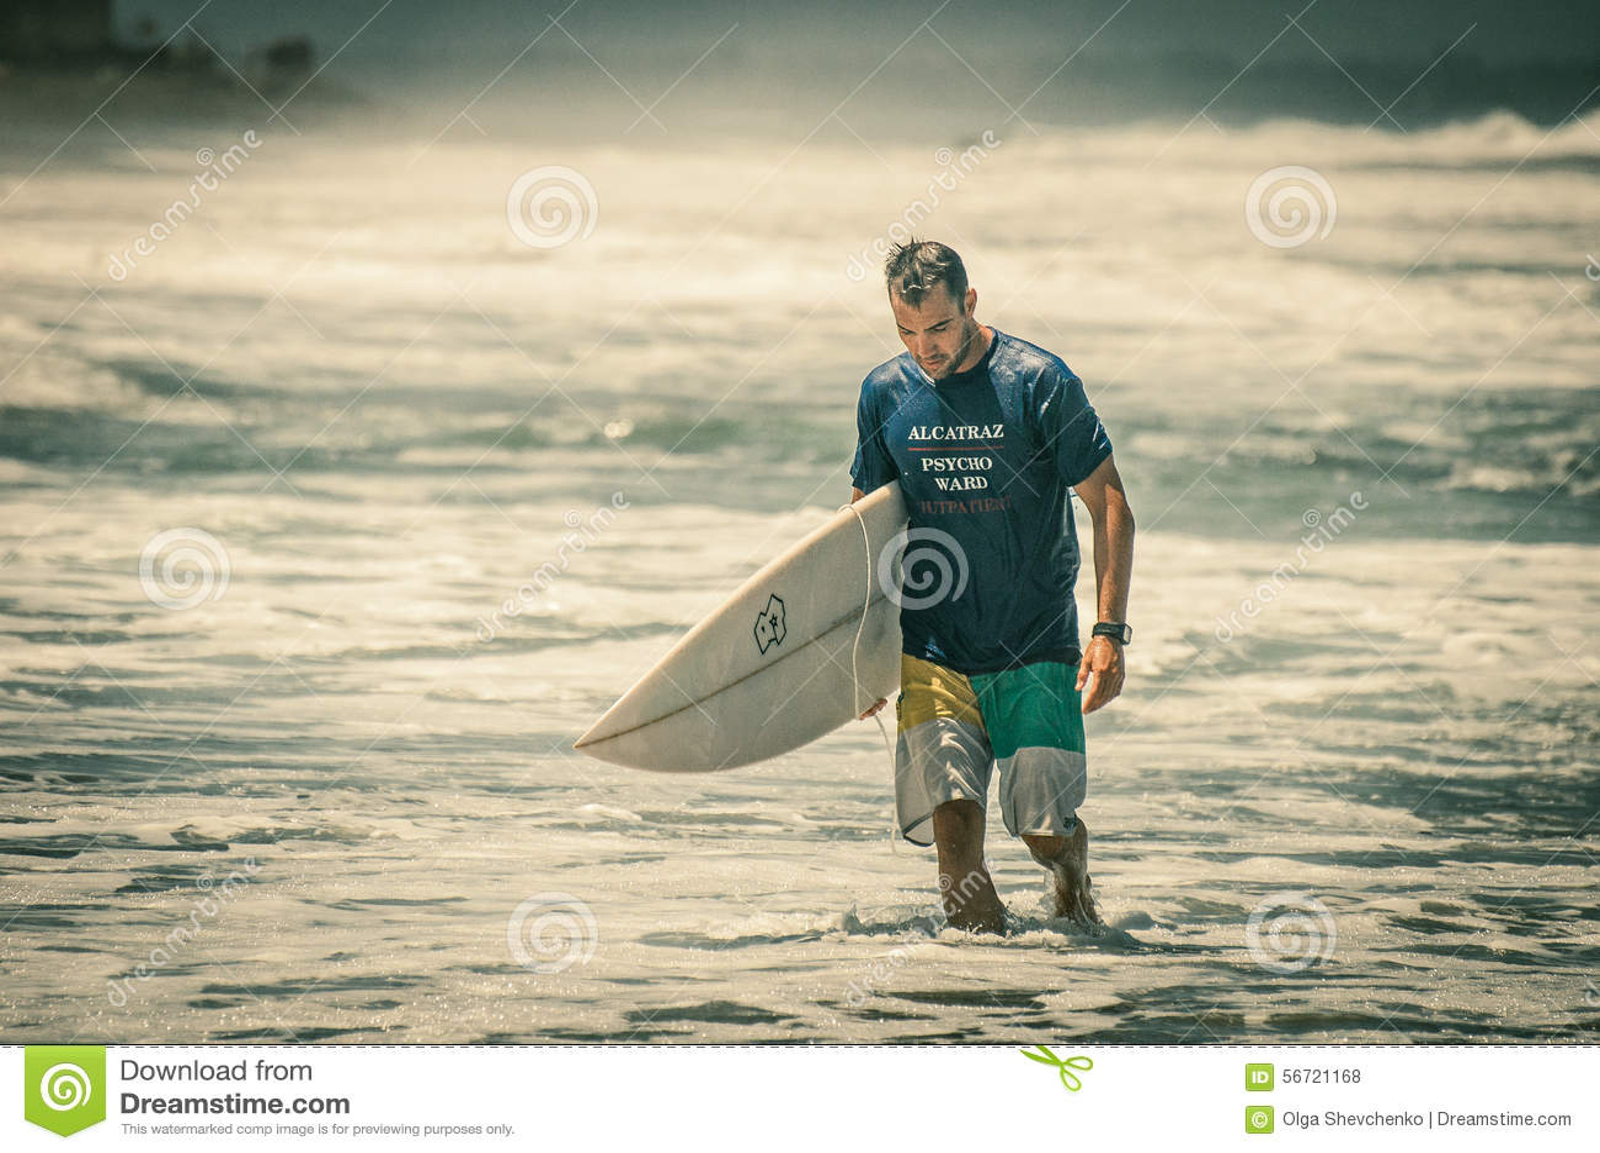 Sad Surfer Walks In Water Editorial Stock Photo - Image: 56721168